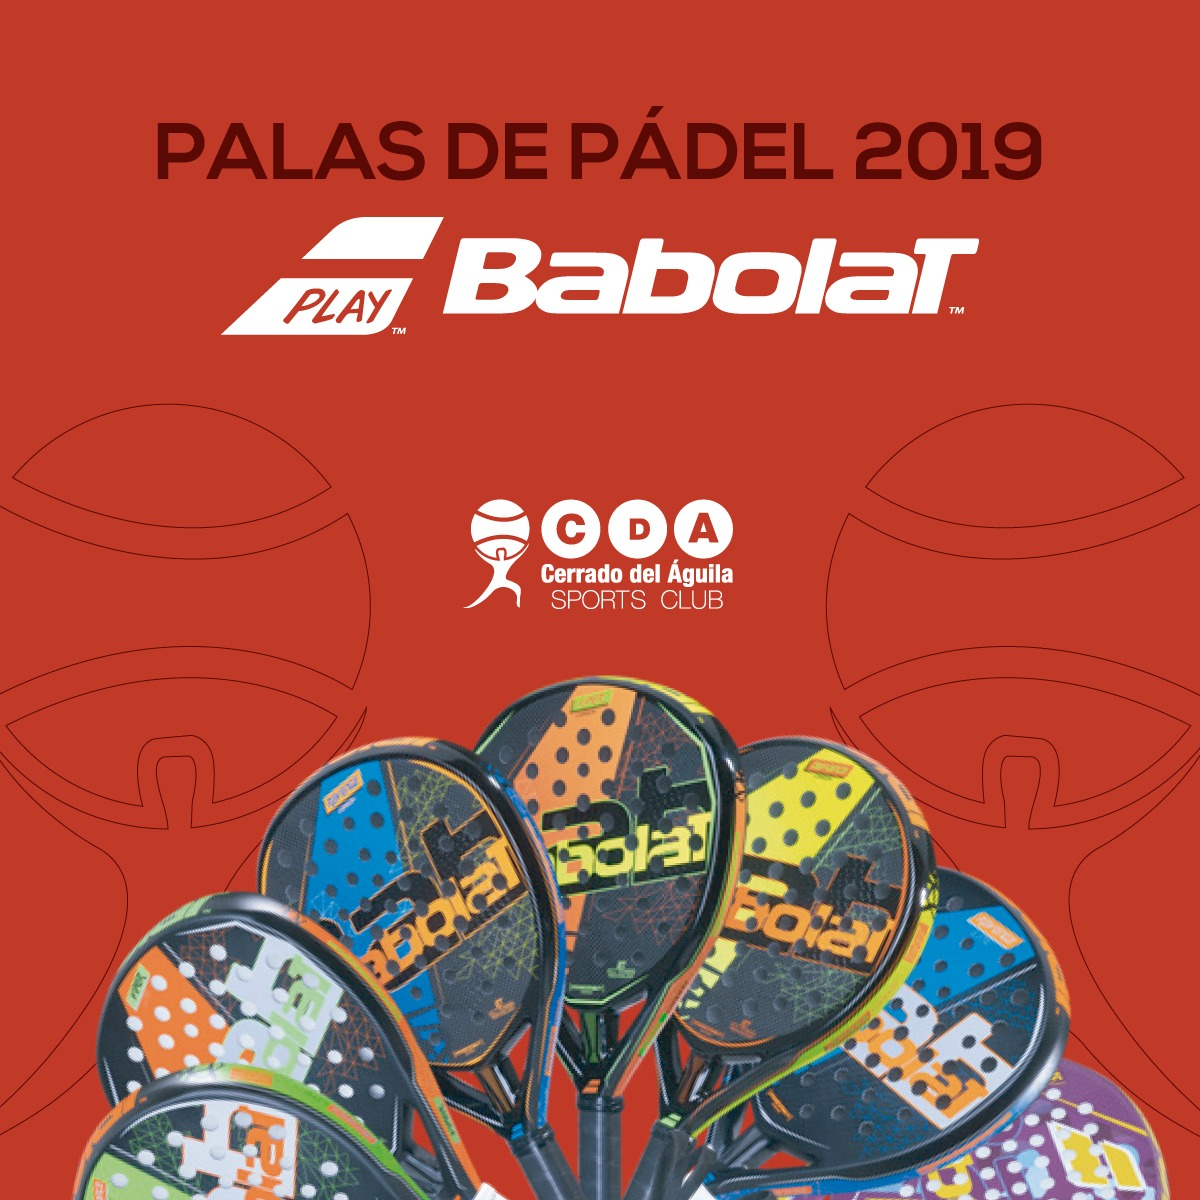 palas babolat 2019